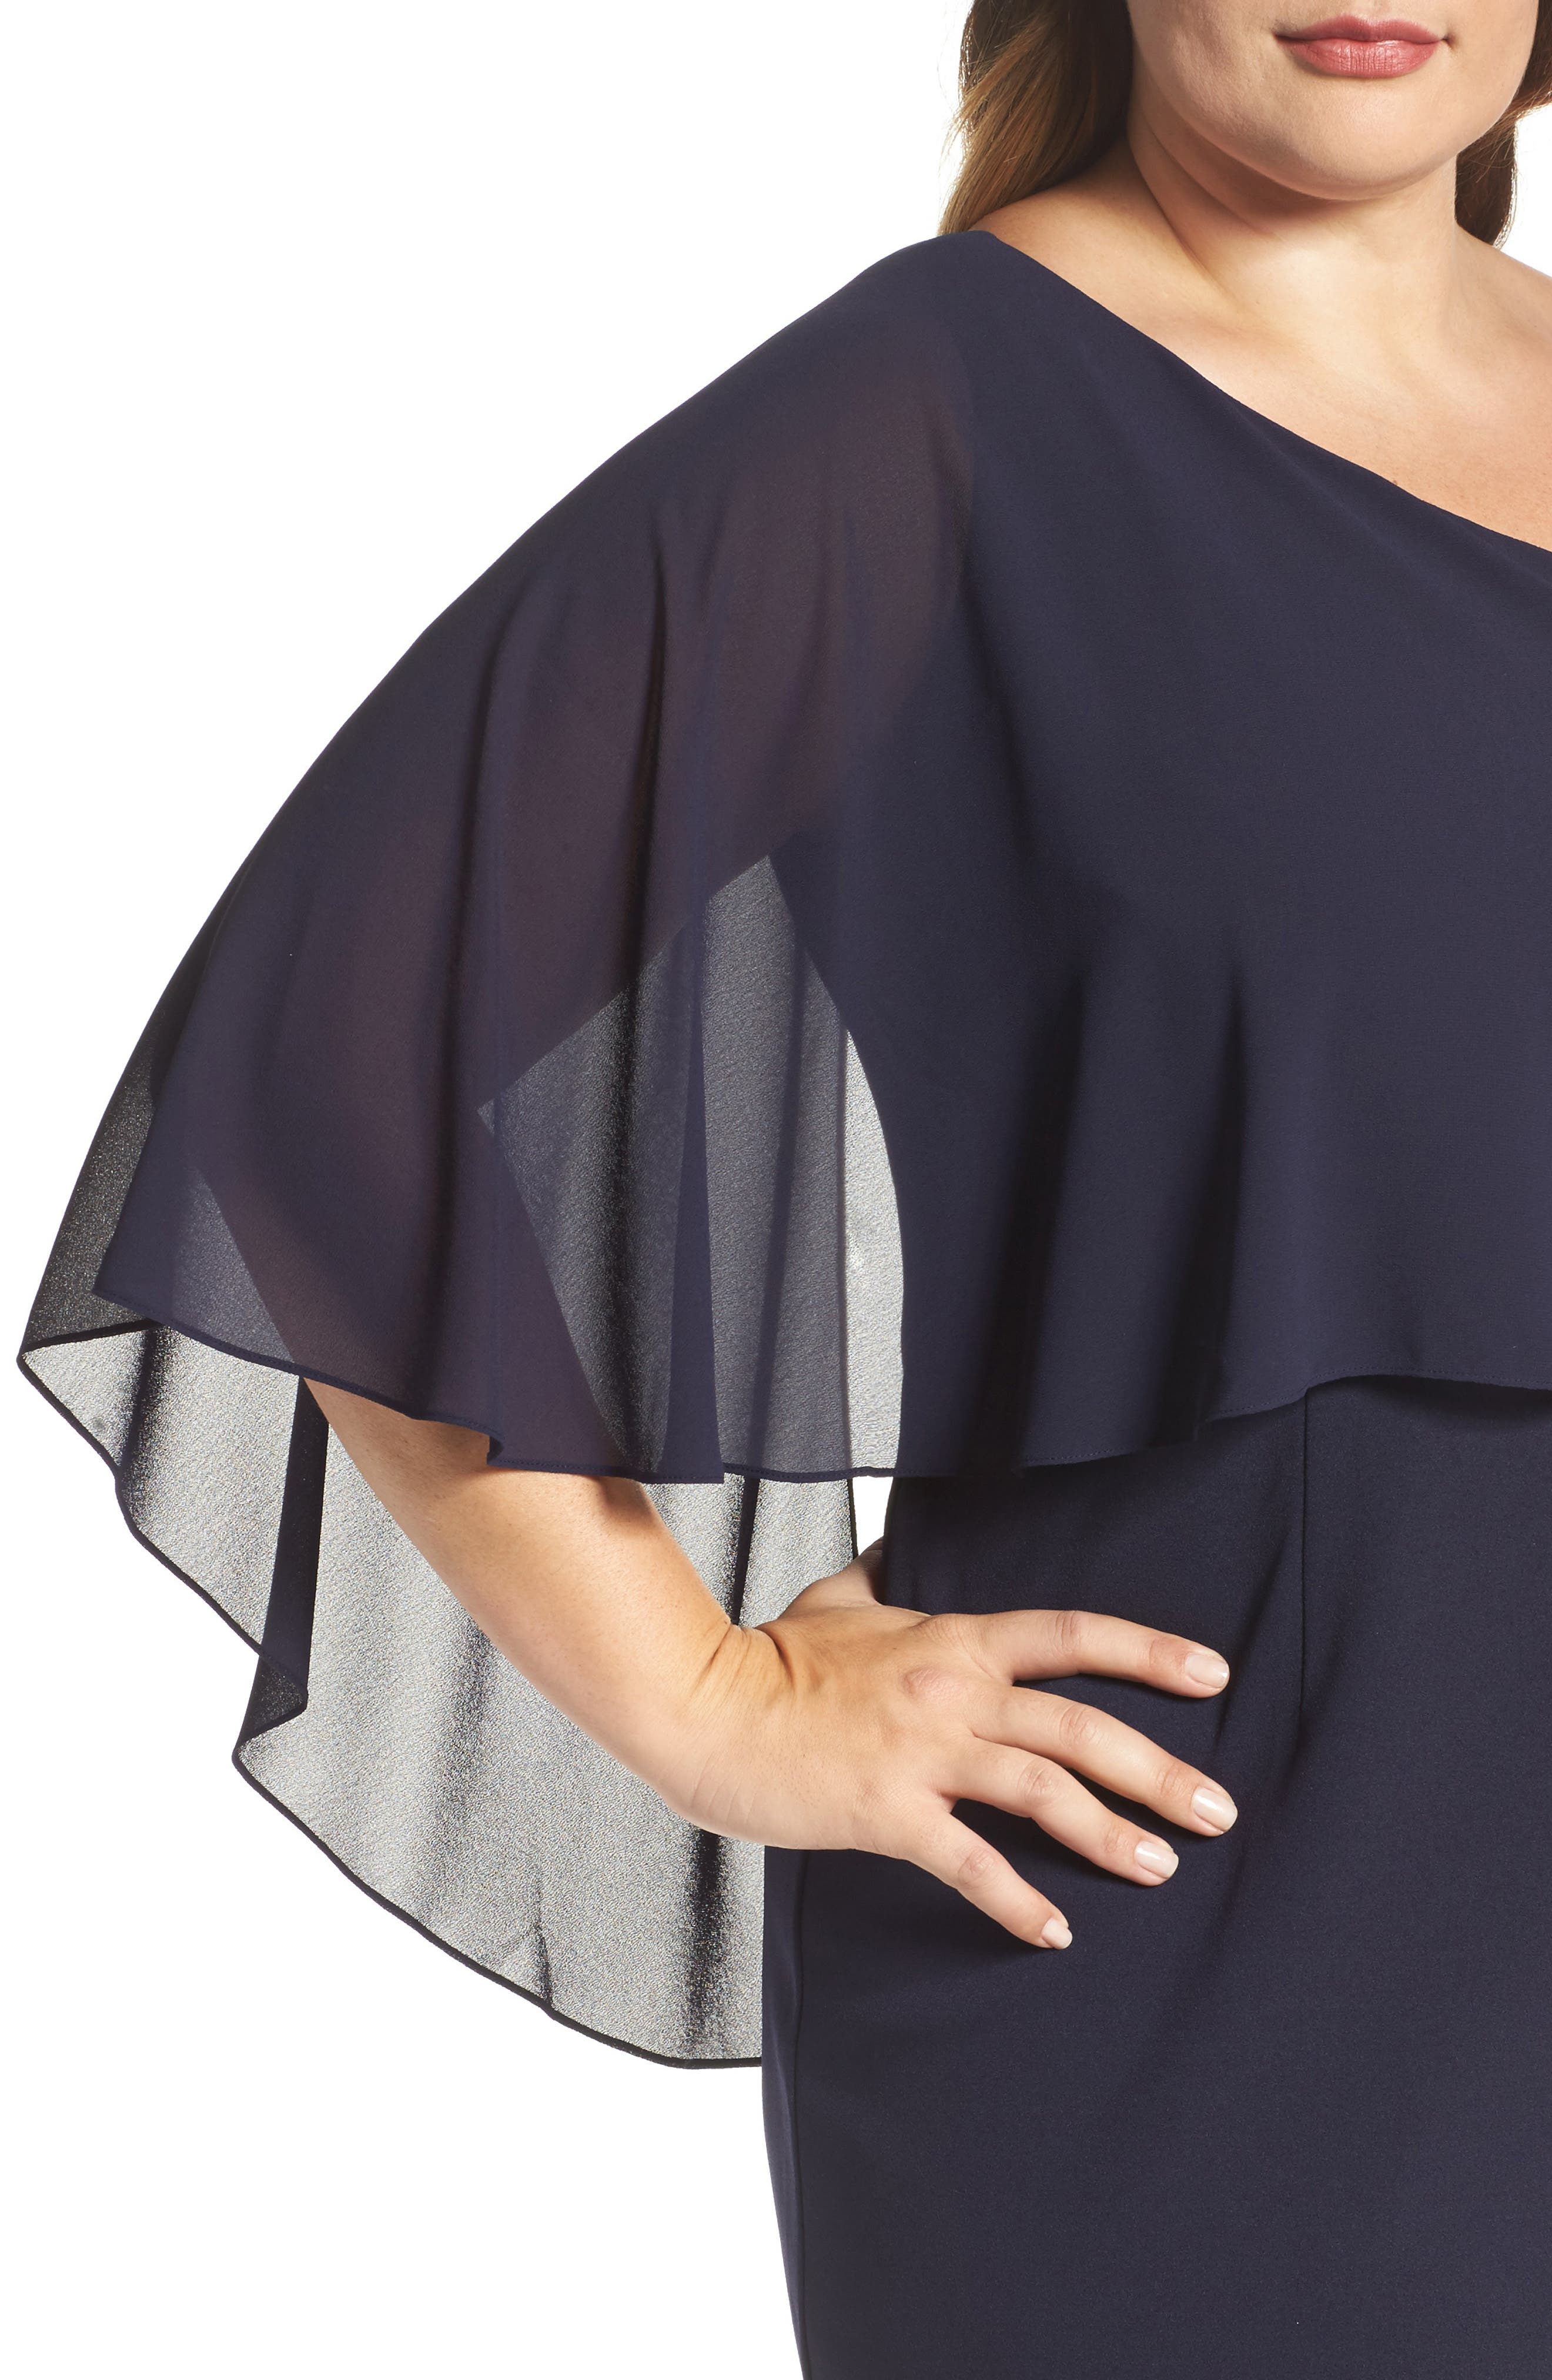 One-Shoulder Sheath Dress,                             Alternate thumbnail 4, color,                             410